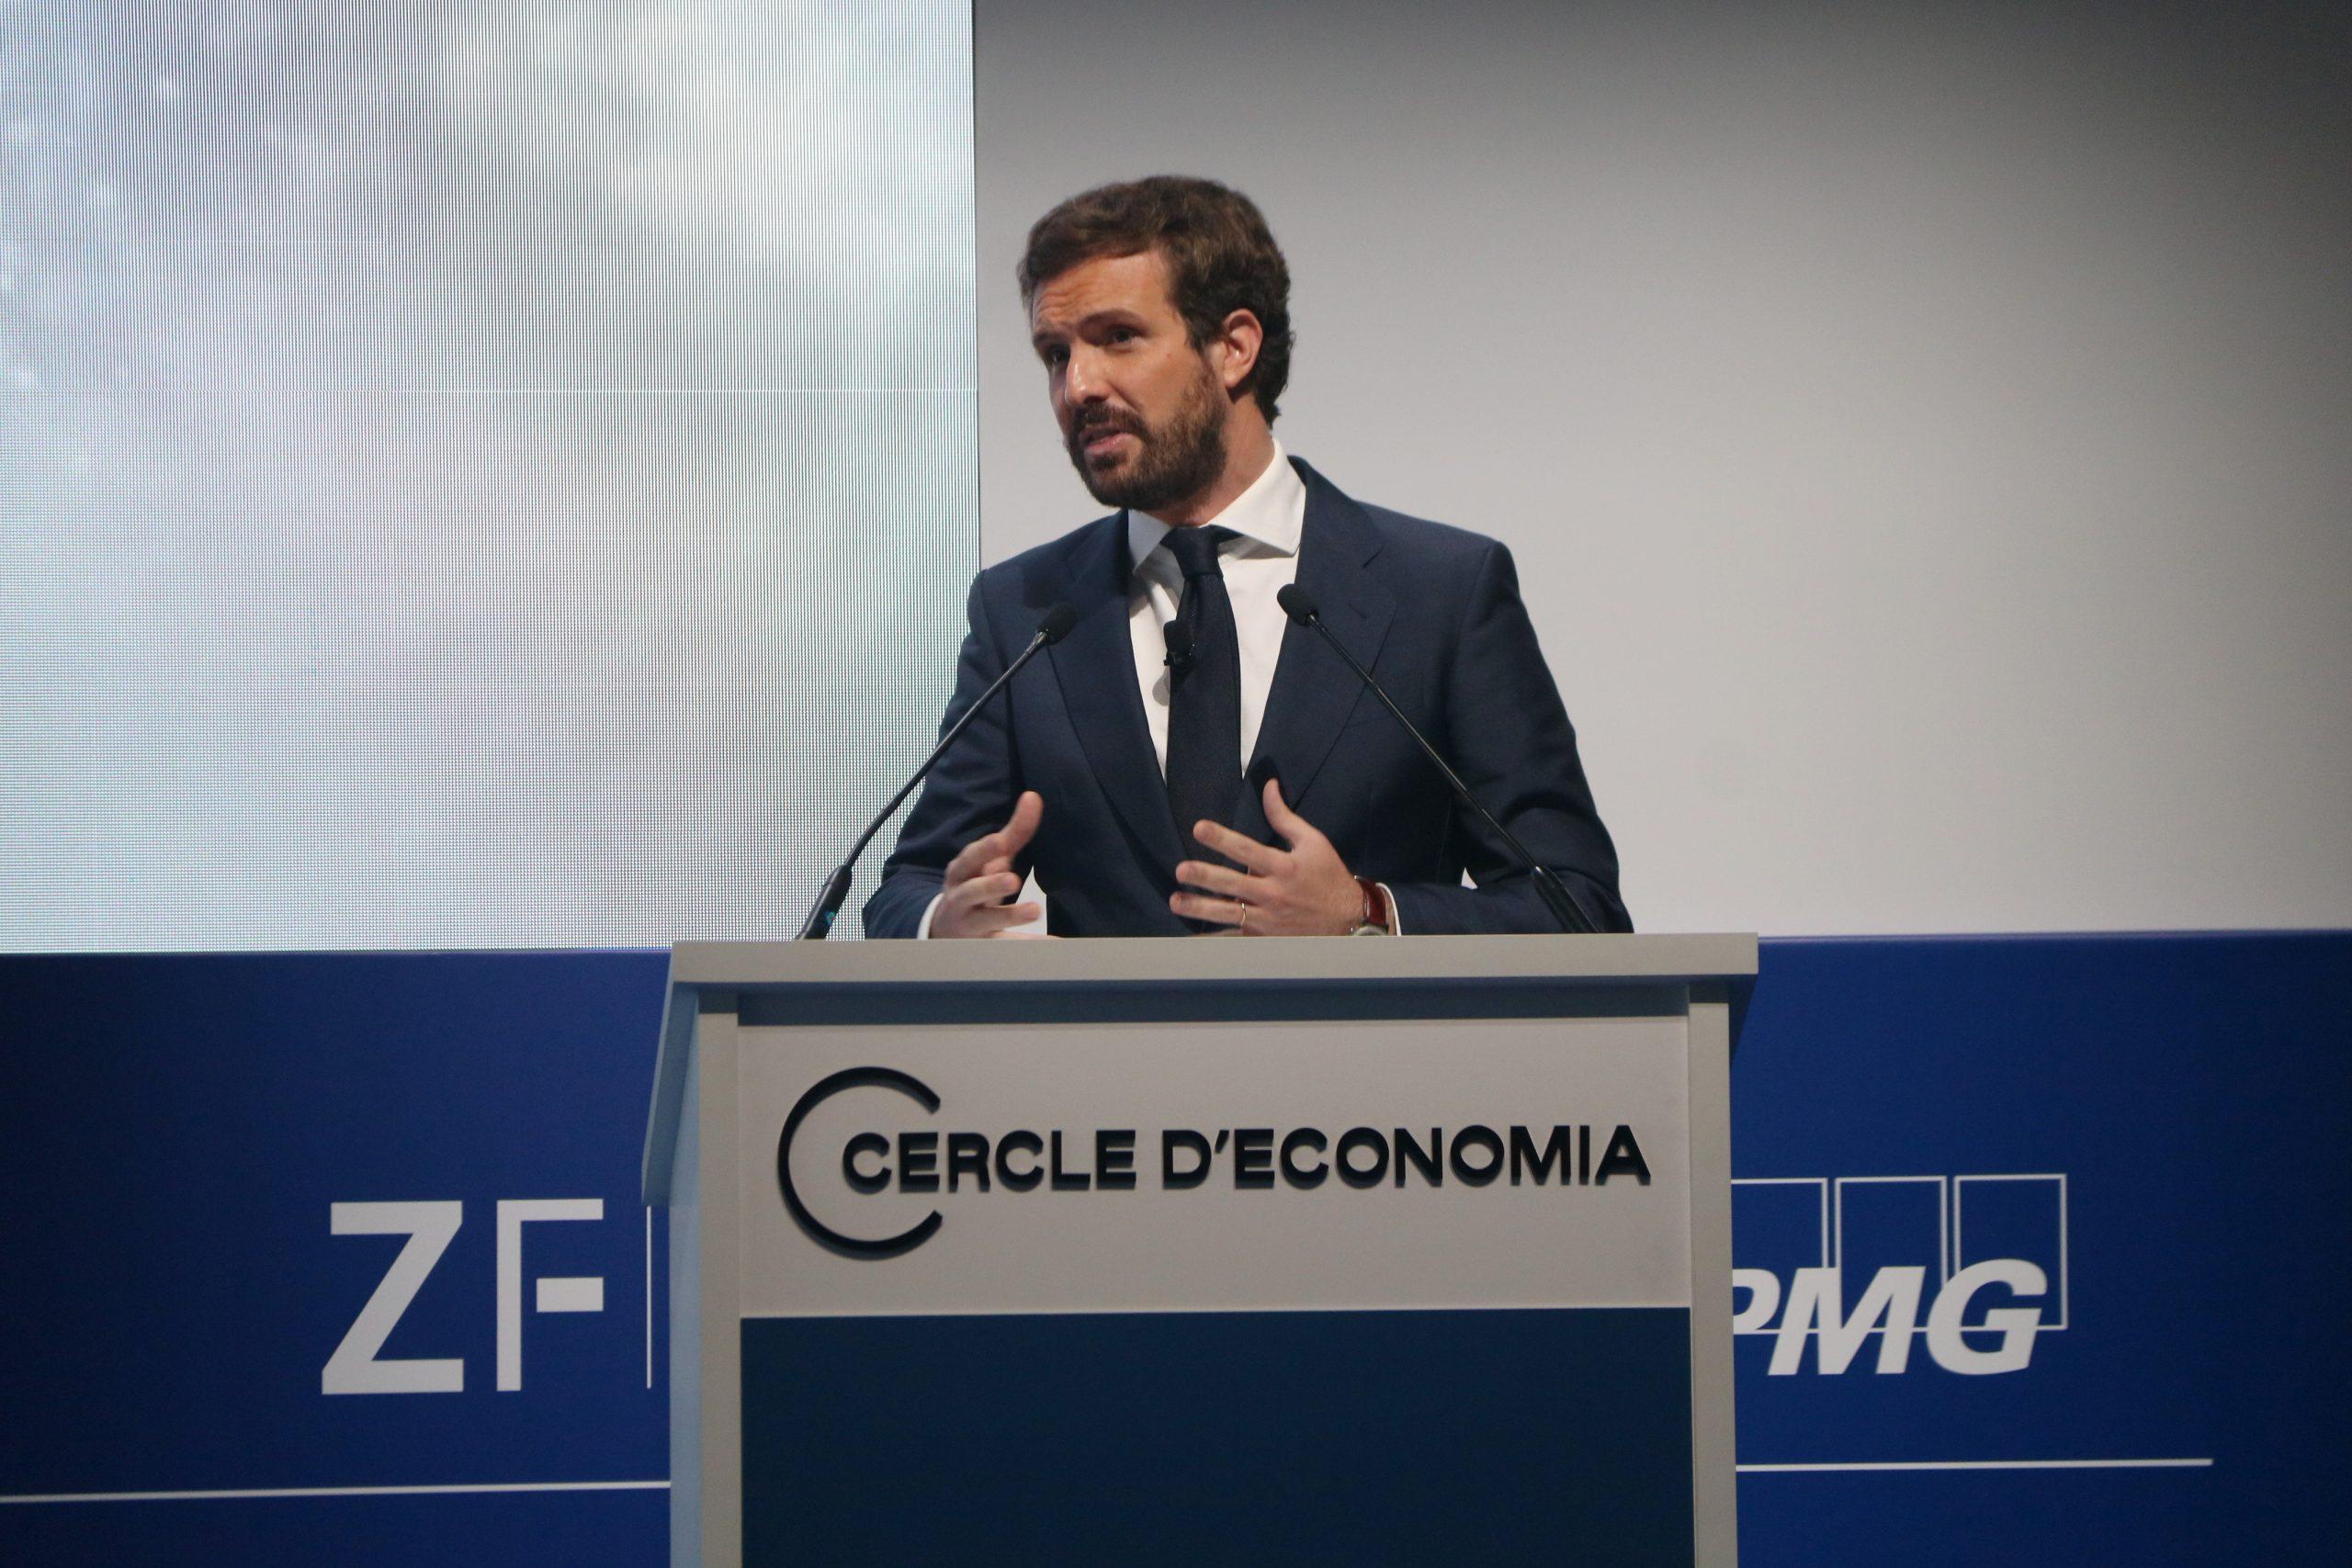 El president del PP, Pablo Casado, durant la seva intervenció al Cercle d'Economia / ACN